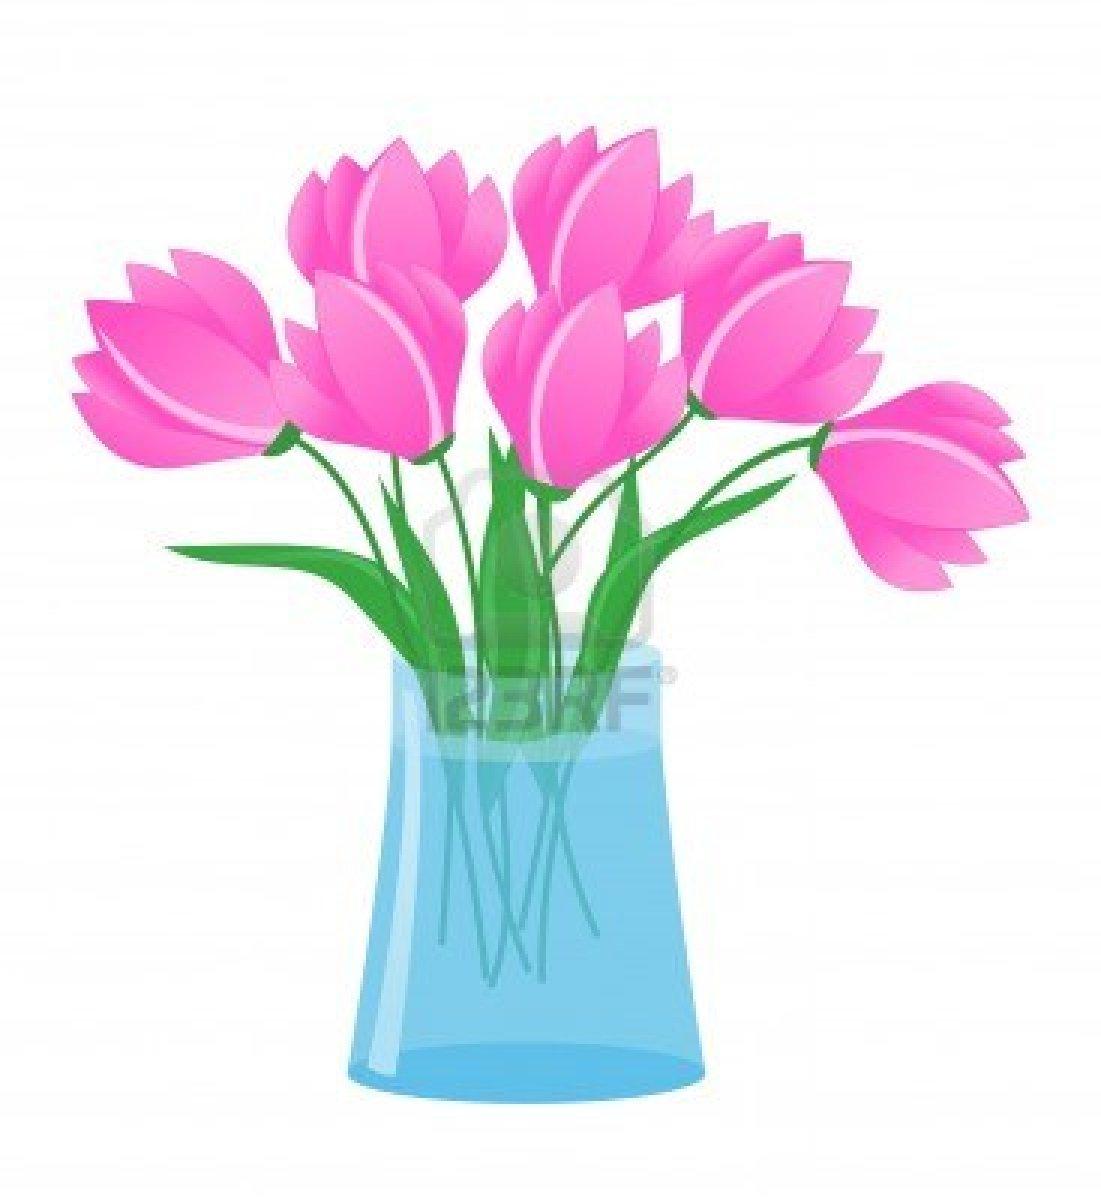 Flower Vase Clipart Clipart Suggest